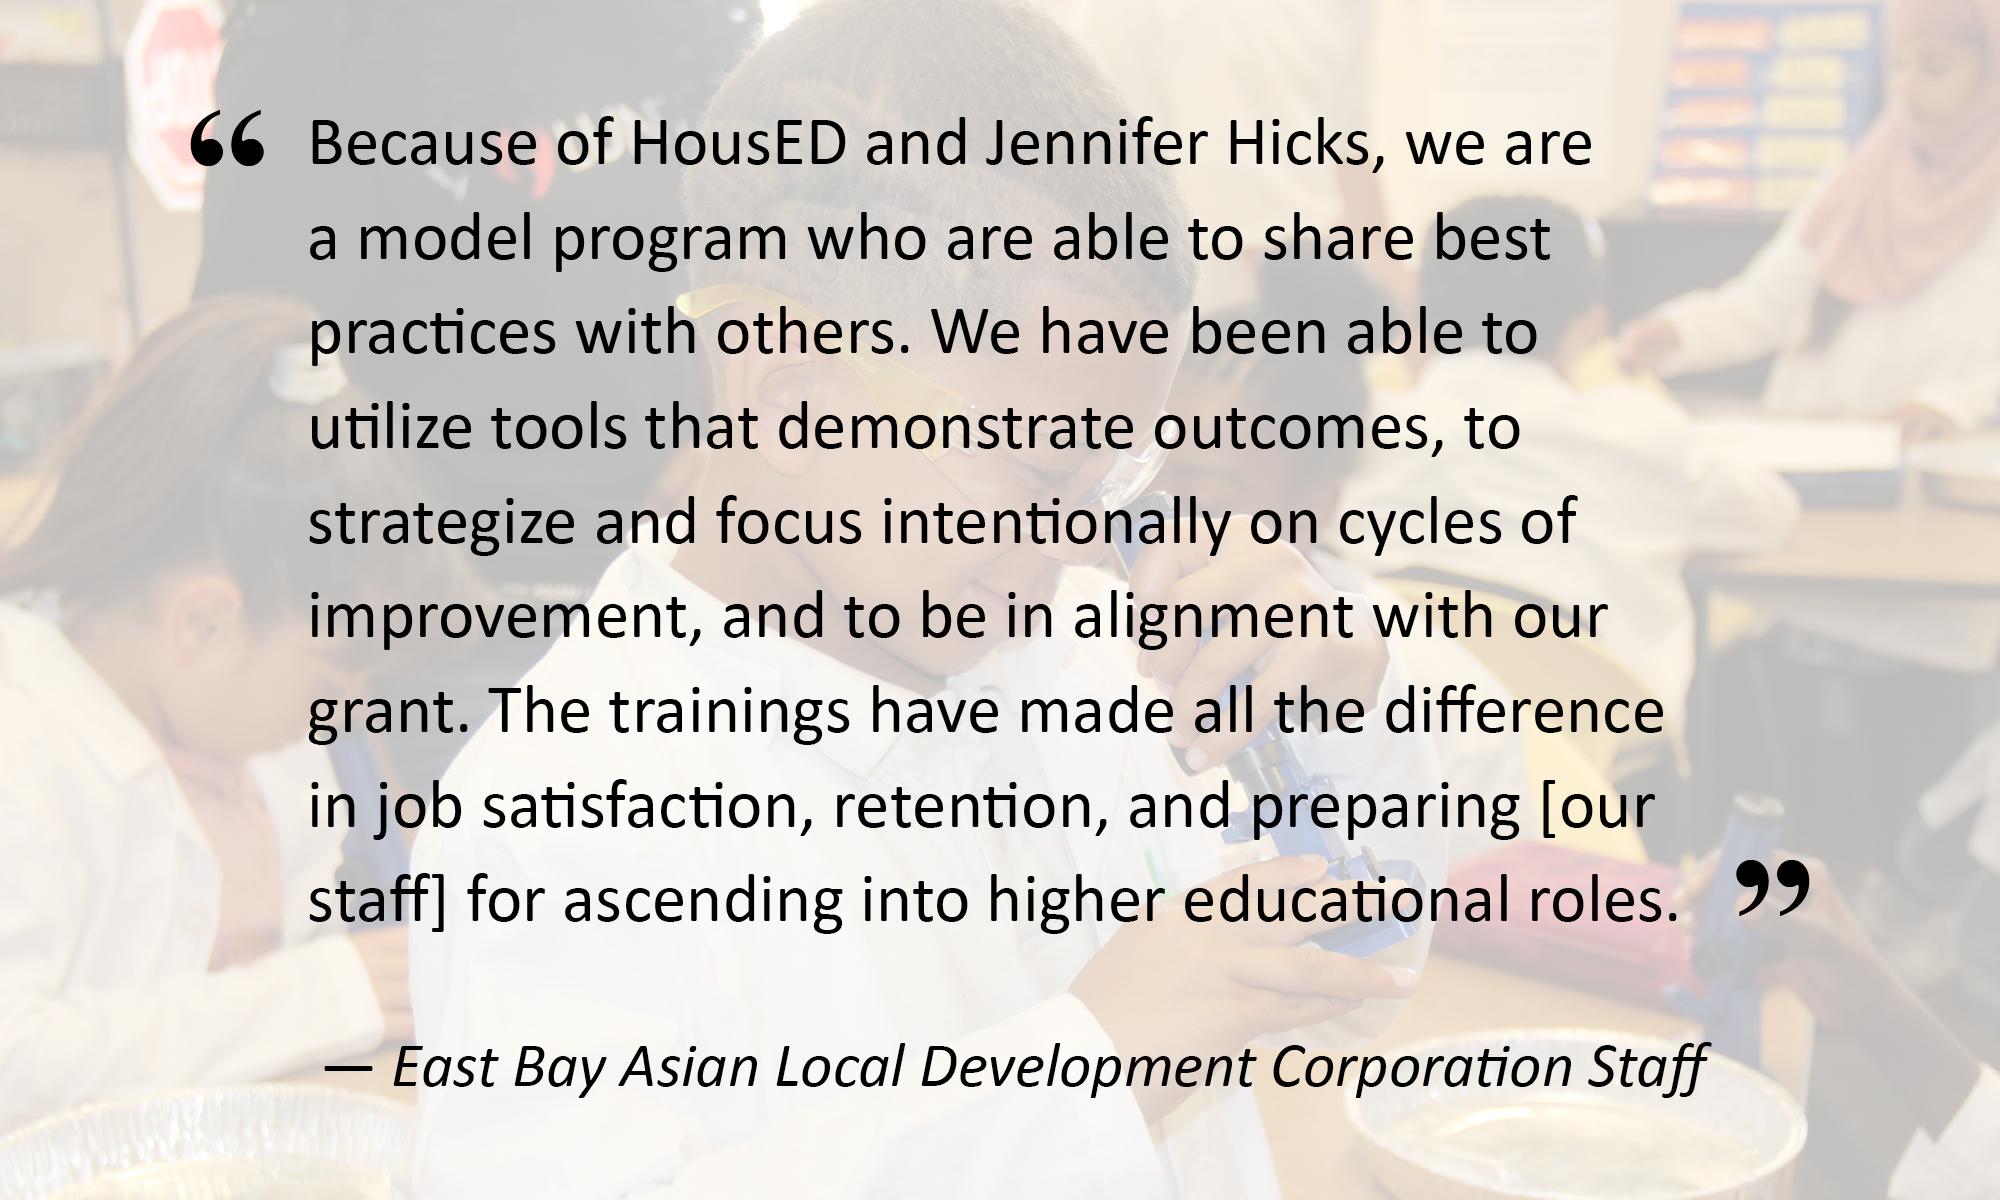 Housing_Education_quote_1.2.jpg